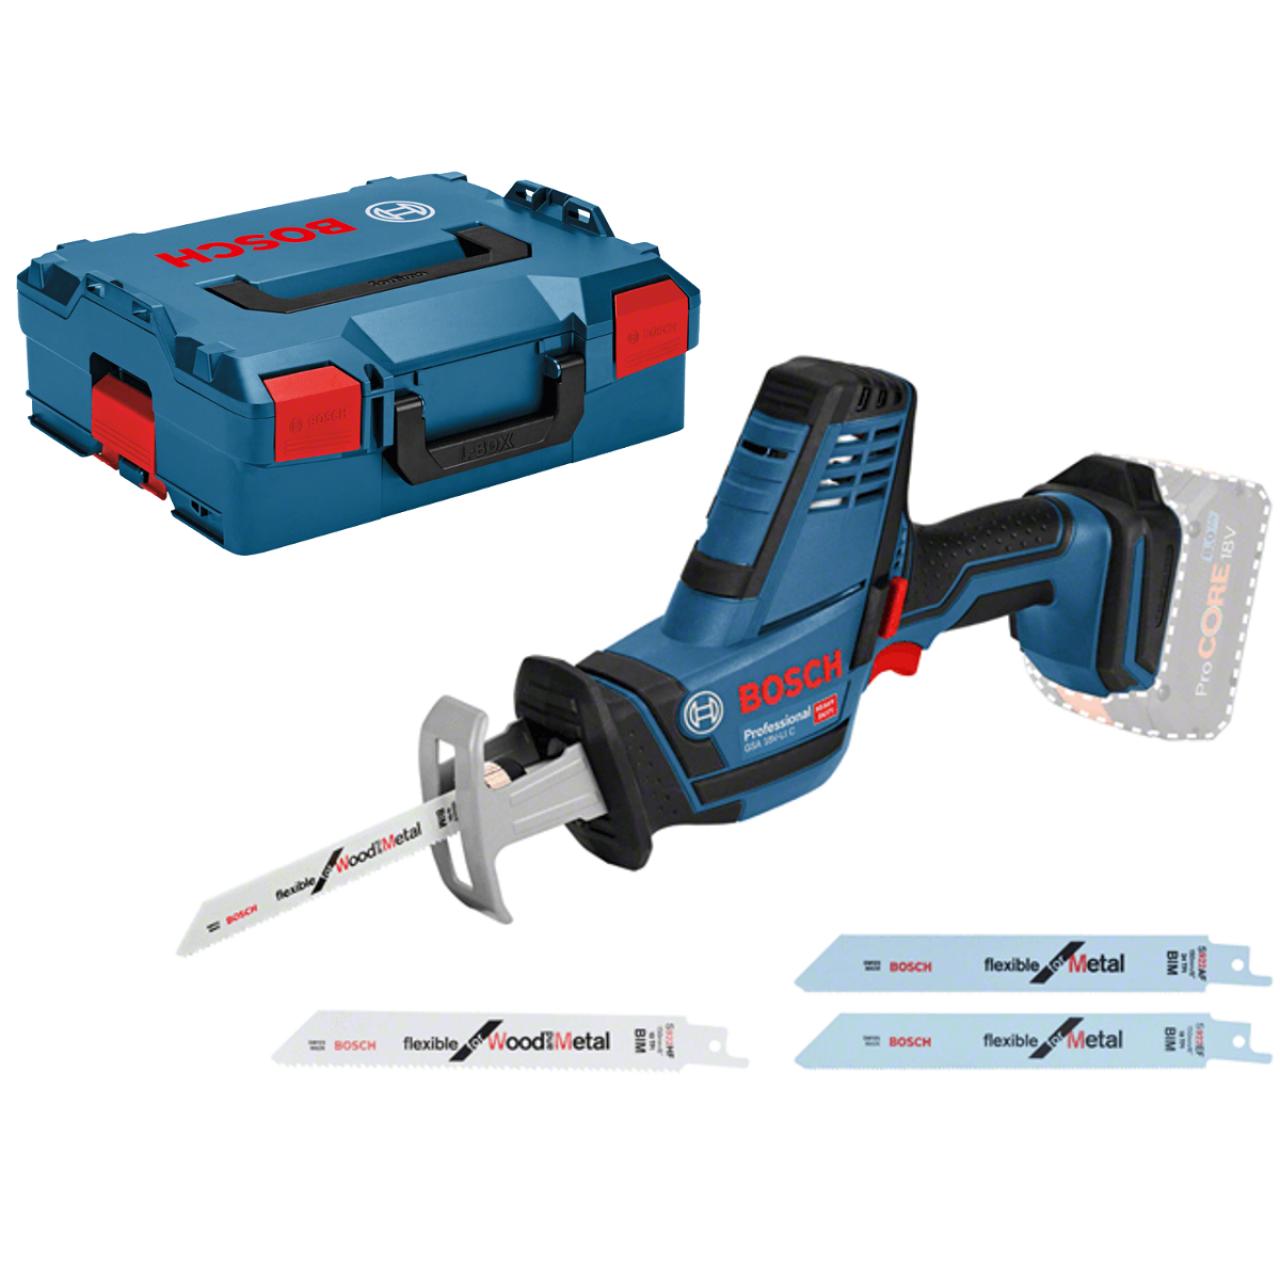 ab3626b92 Akku-Säbelsäge GSA 18 V-LI C, Solo Version, L-BOXX | Sägen | Sägen &  Trennen | 18 Volt System | Bosch | Elektrowerkzeuge | Kategorien | Müller  Professional ...